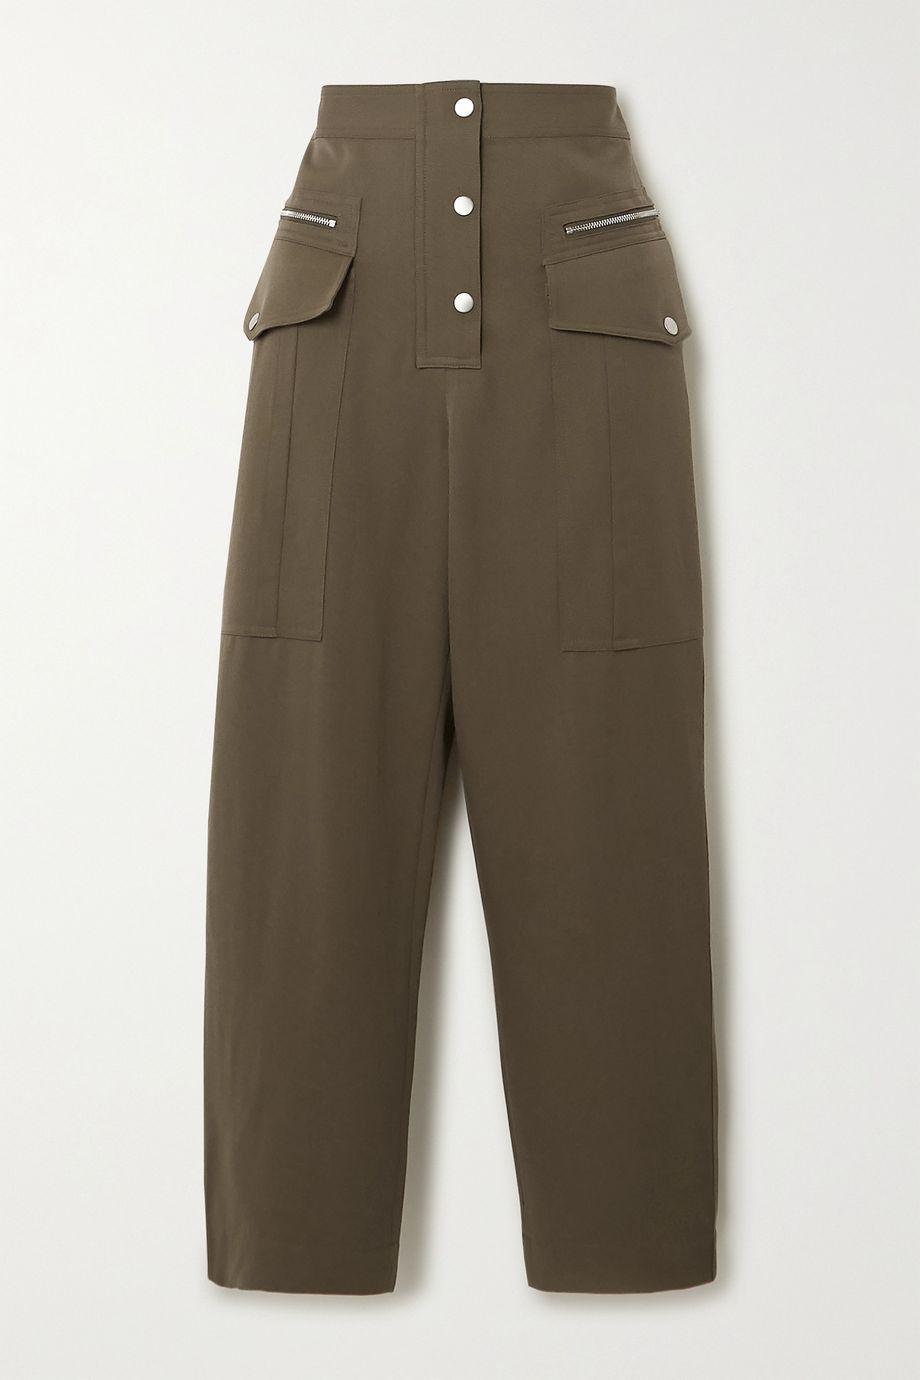 3.1 Phillip Lim Wool-twill straight-leg pants